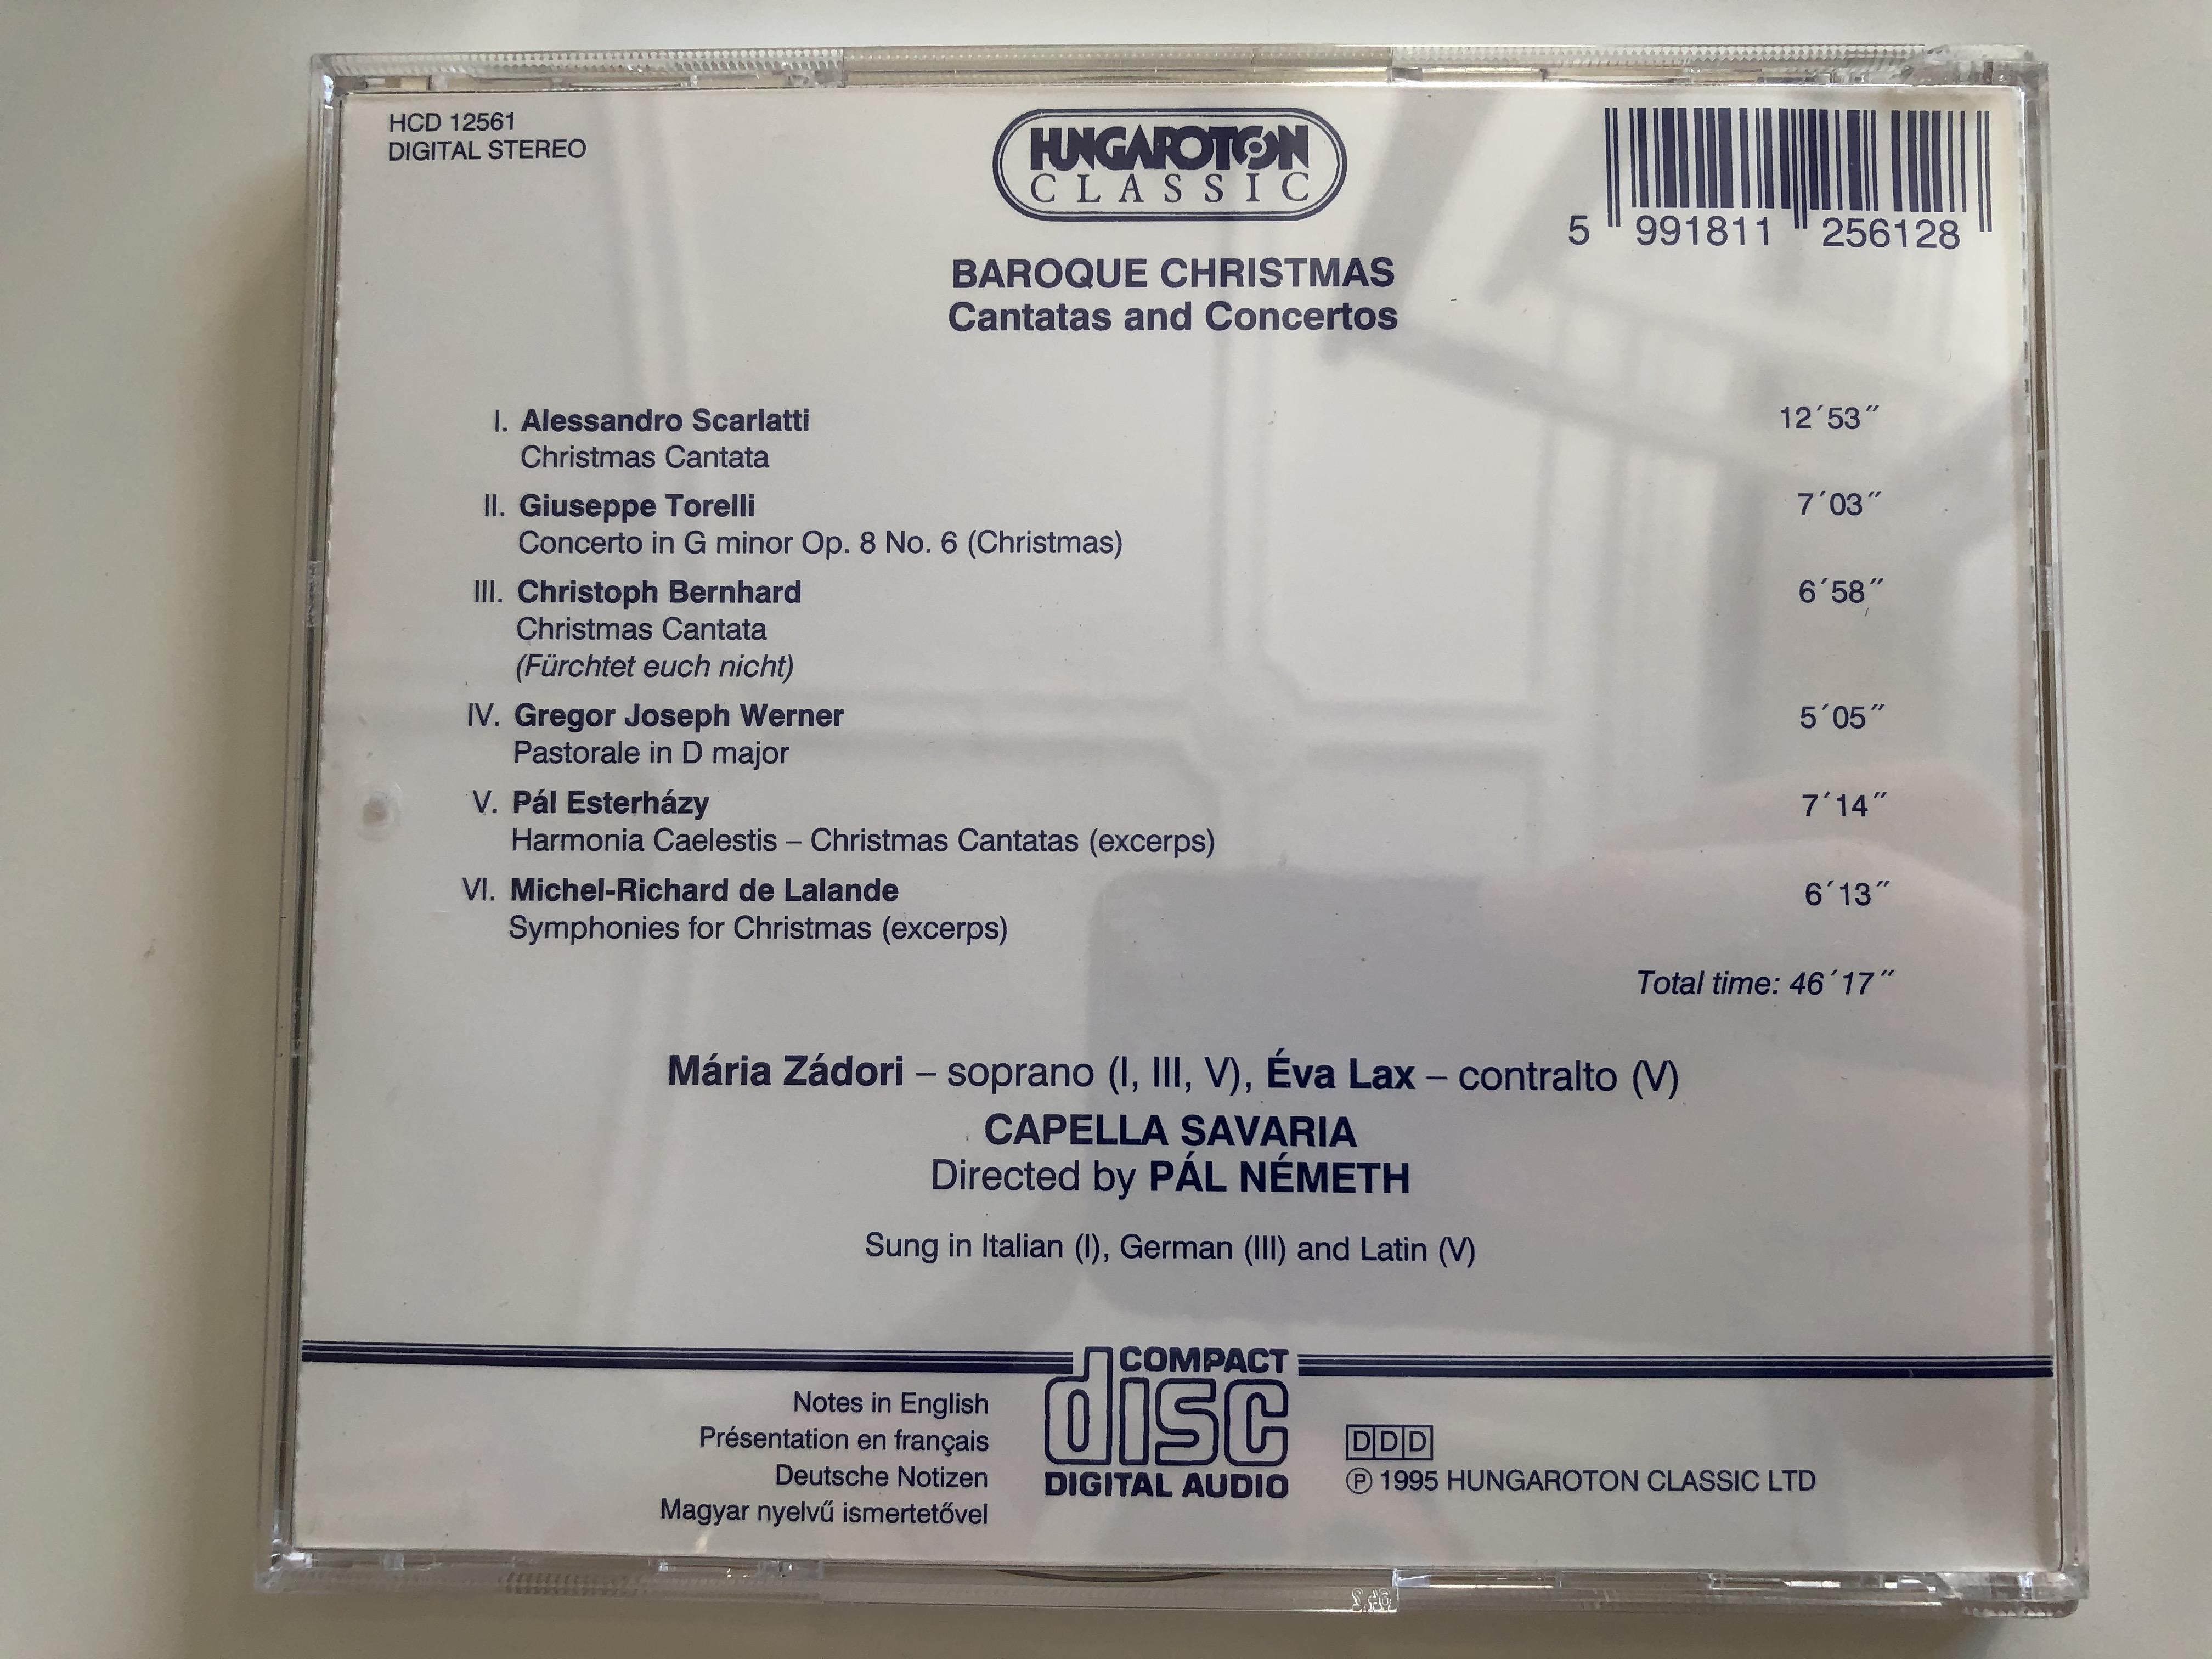 baroque-christmas-concertos-cantatas-a.-scarlatti-torelli-esterh-zy-de-lalande-m-ria-z-dori-capella-savaria-p-l-n-meth-hungaroton-classic-audio-cd-1995-stereo-hcd-12561-7-.jpg